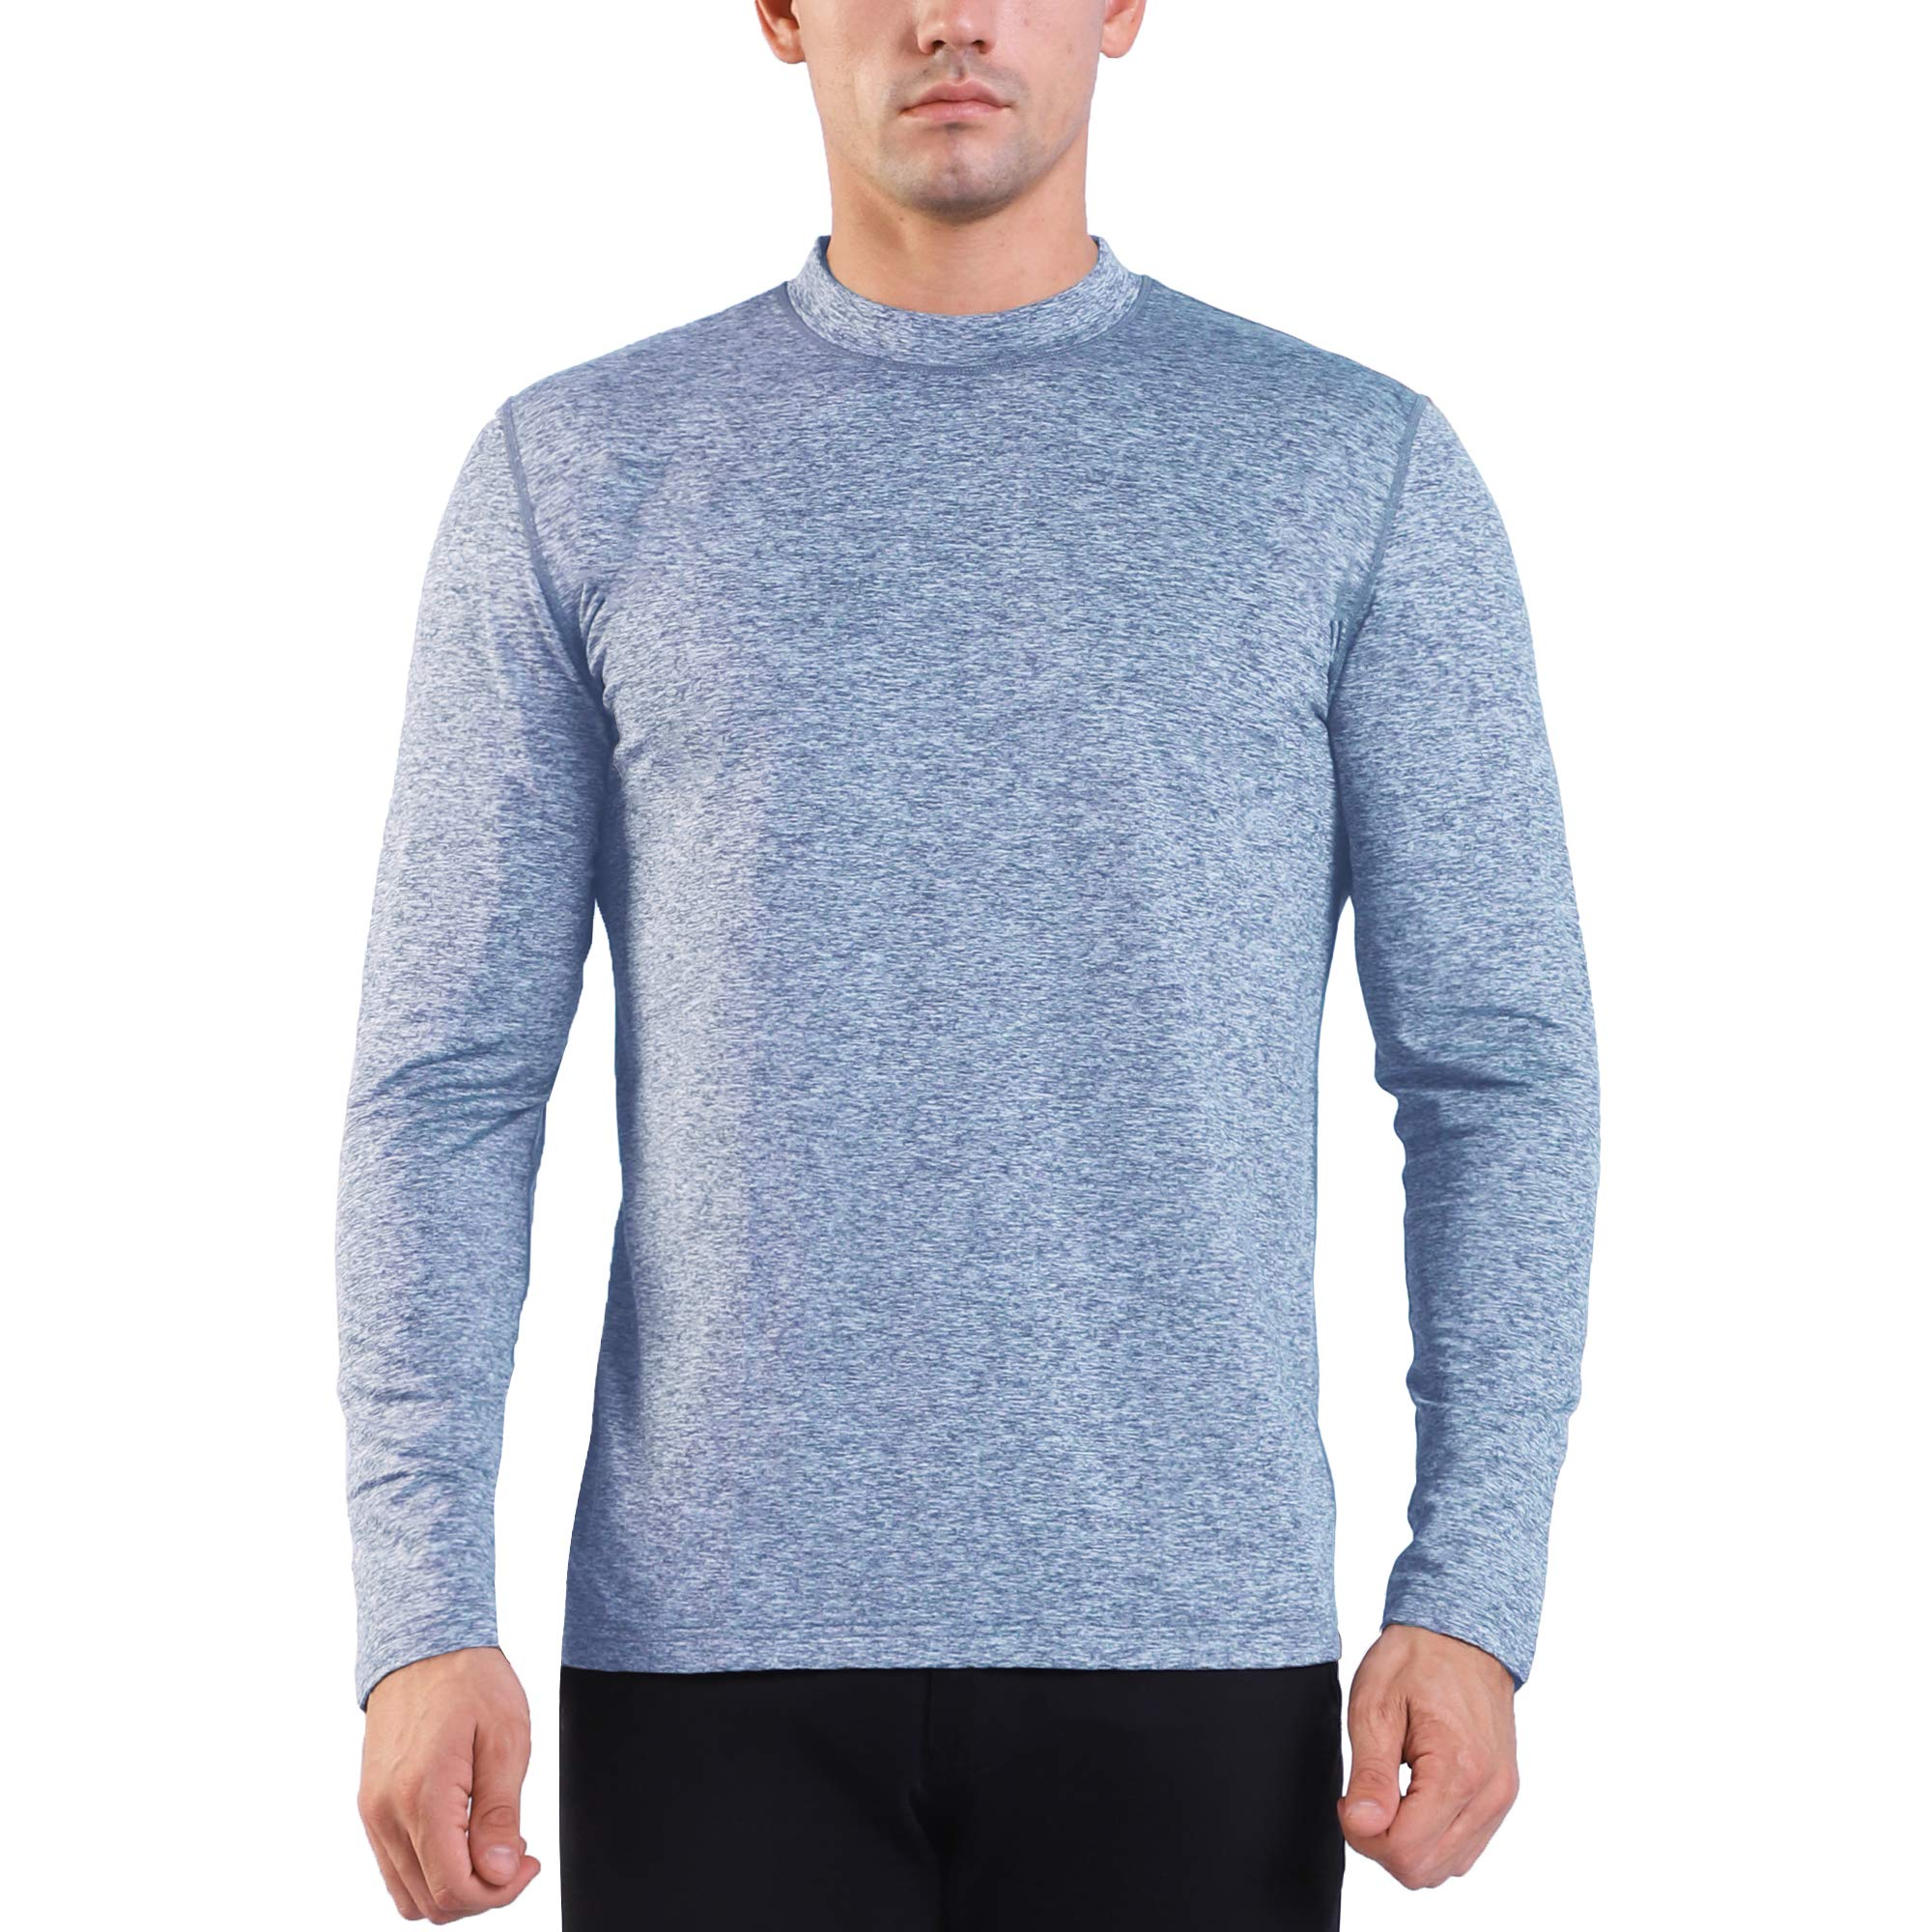 Ogeenier Men's Fleece Thermal Top Mock Long Sleeve Athletic T-Shirt,Heather Blue,XL by Ogeenier